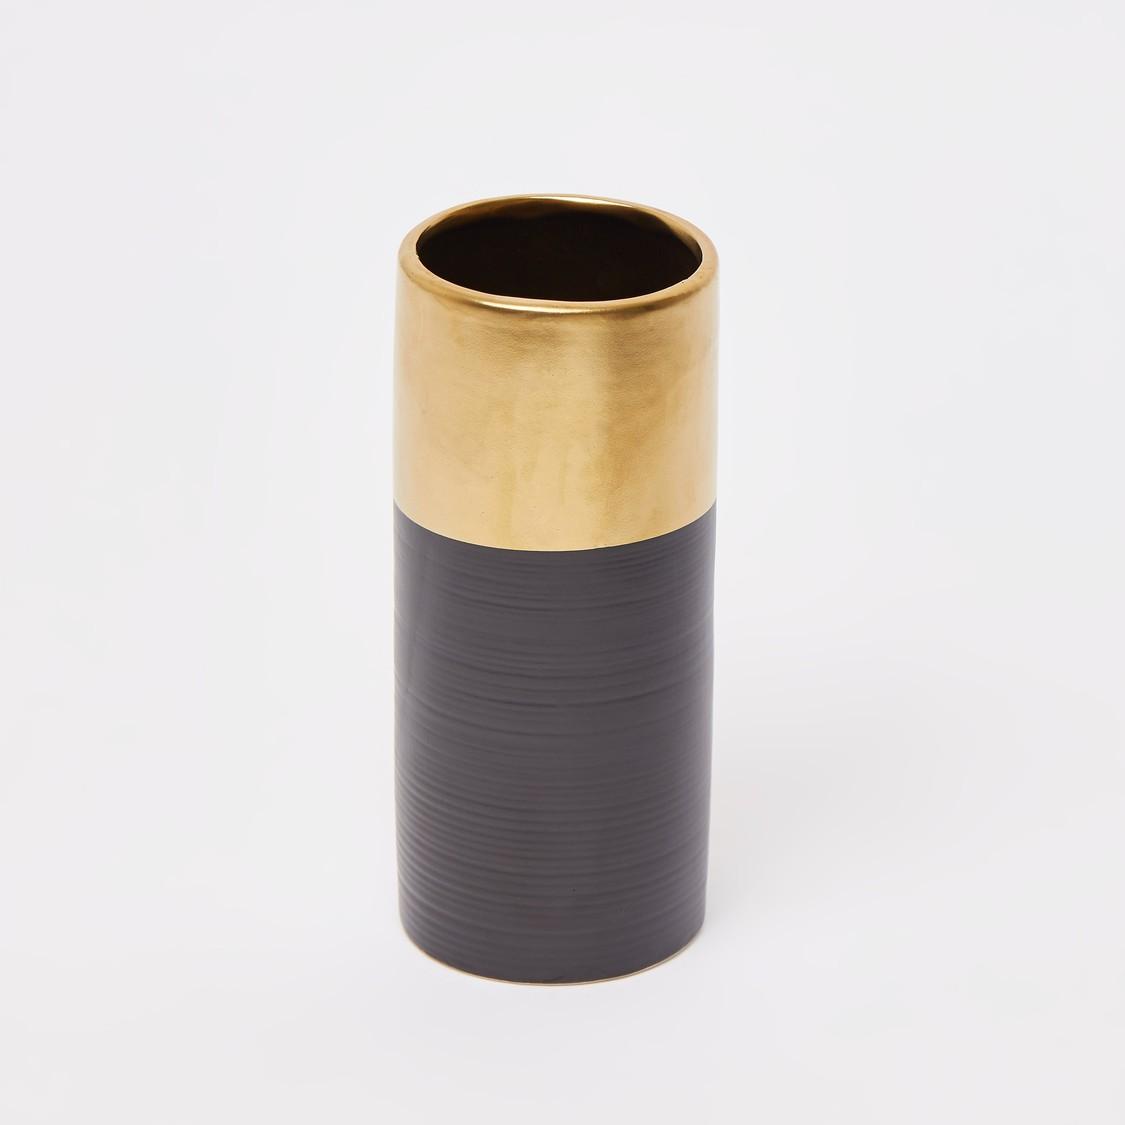 Textured Cylindrical Vase - 16.5x7 cms